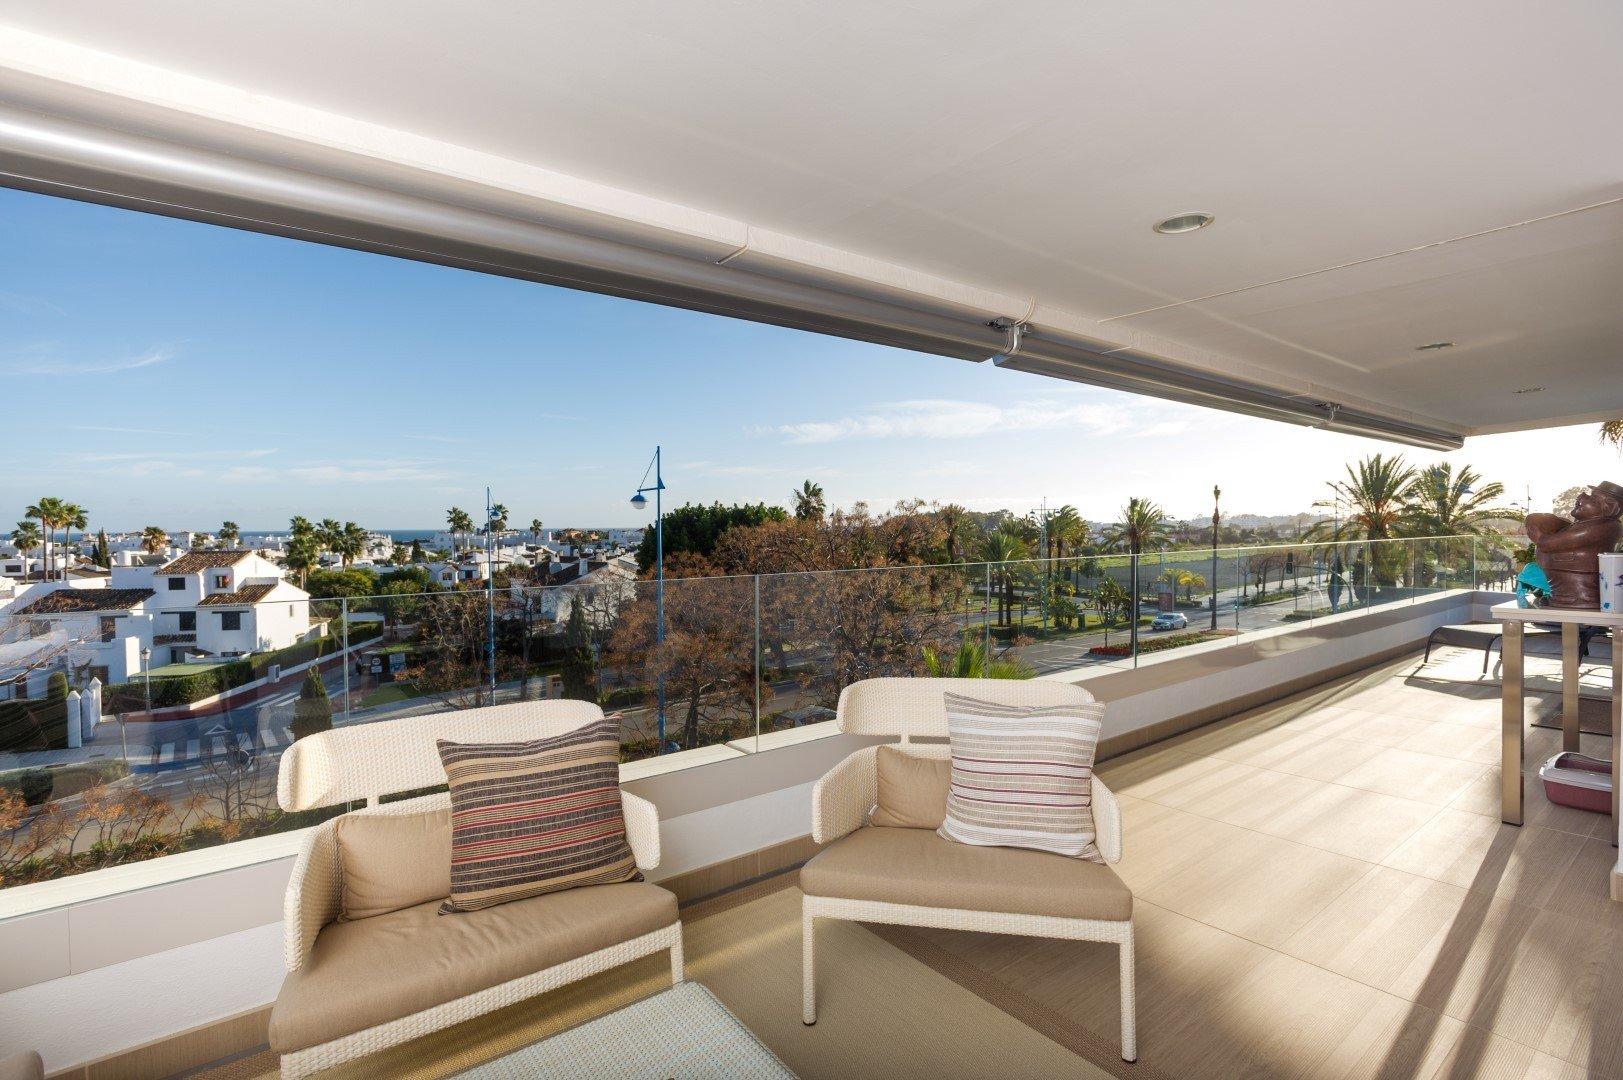 Apartment for sale in San Pedro Alcantara, Acqua